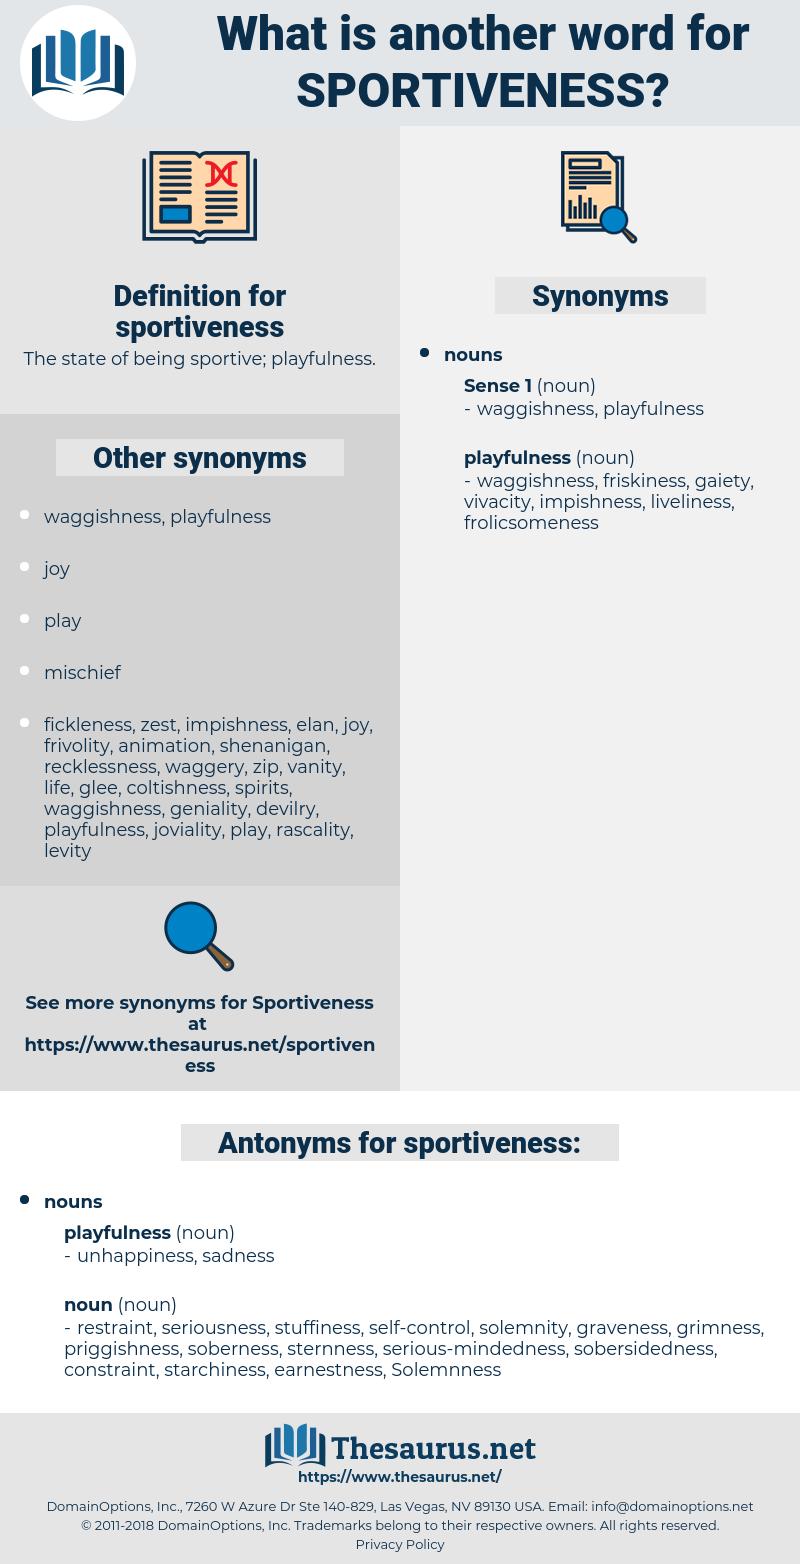 sportiveness, synonym sportiveness, another word for sportiveness, words like sportiveness, thesaurus sportiveness